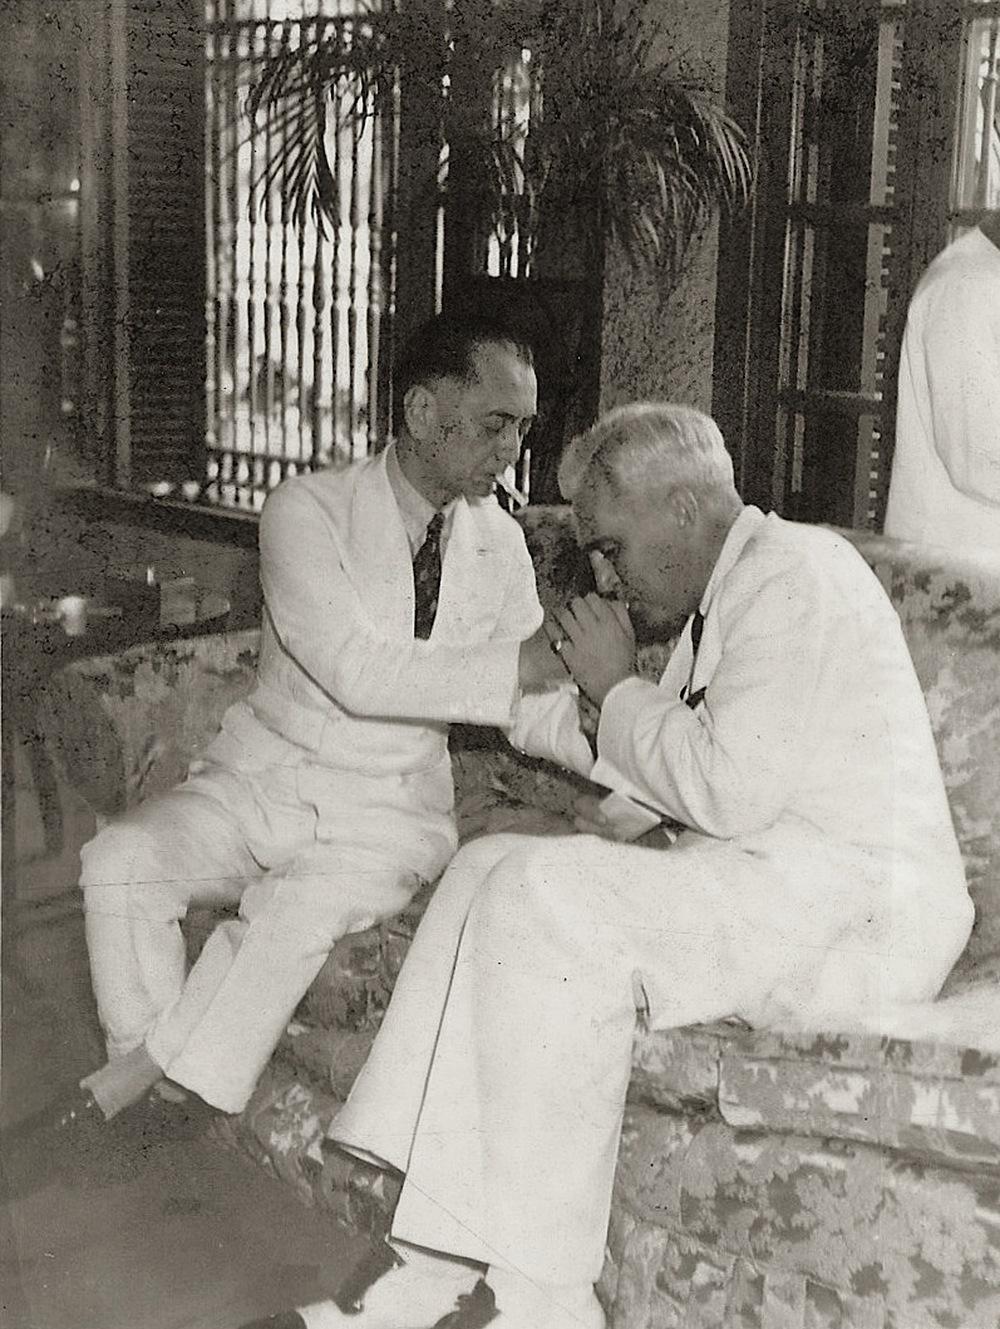 PresidentQuezonwithU.S.HighCommissionerMcNutt,1938